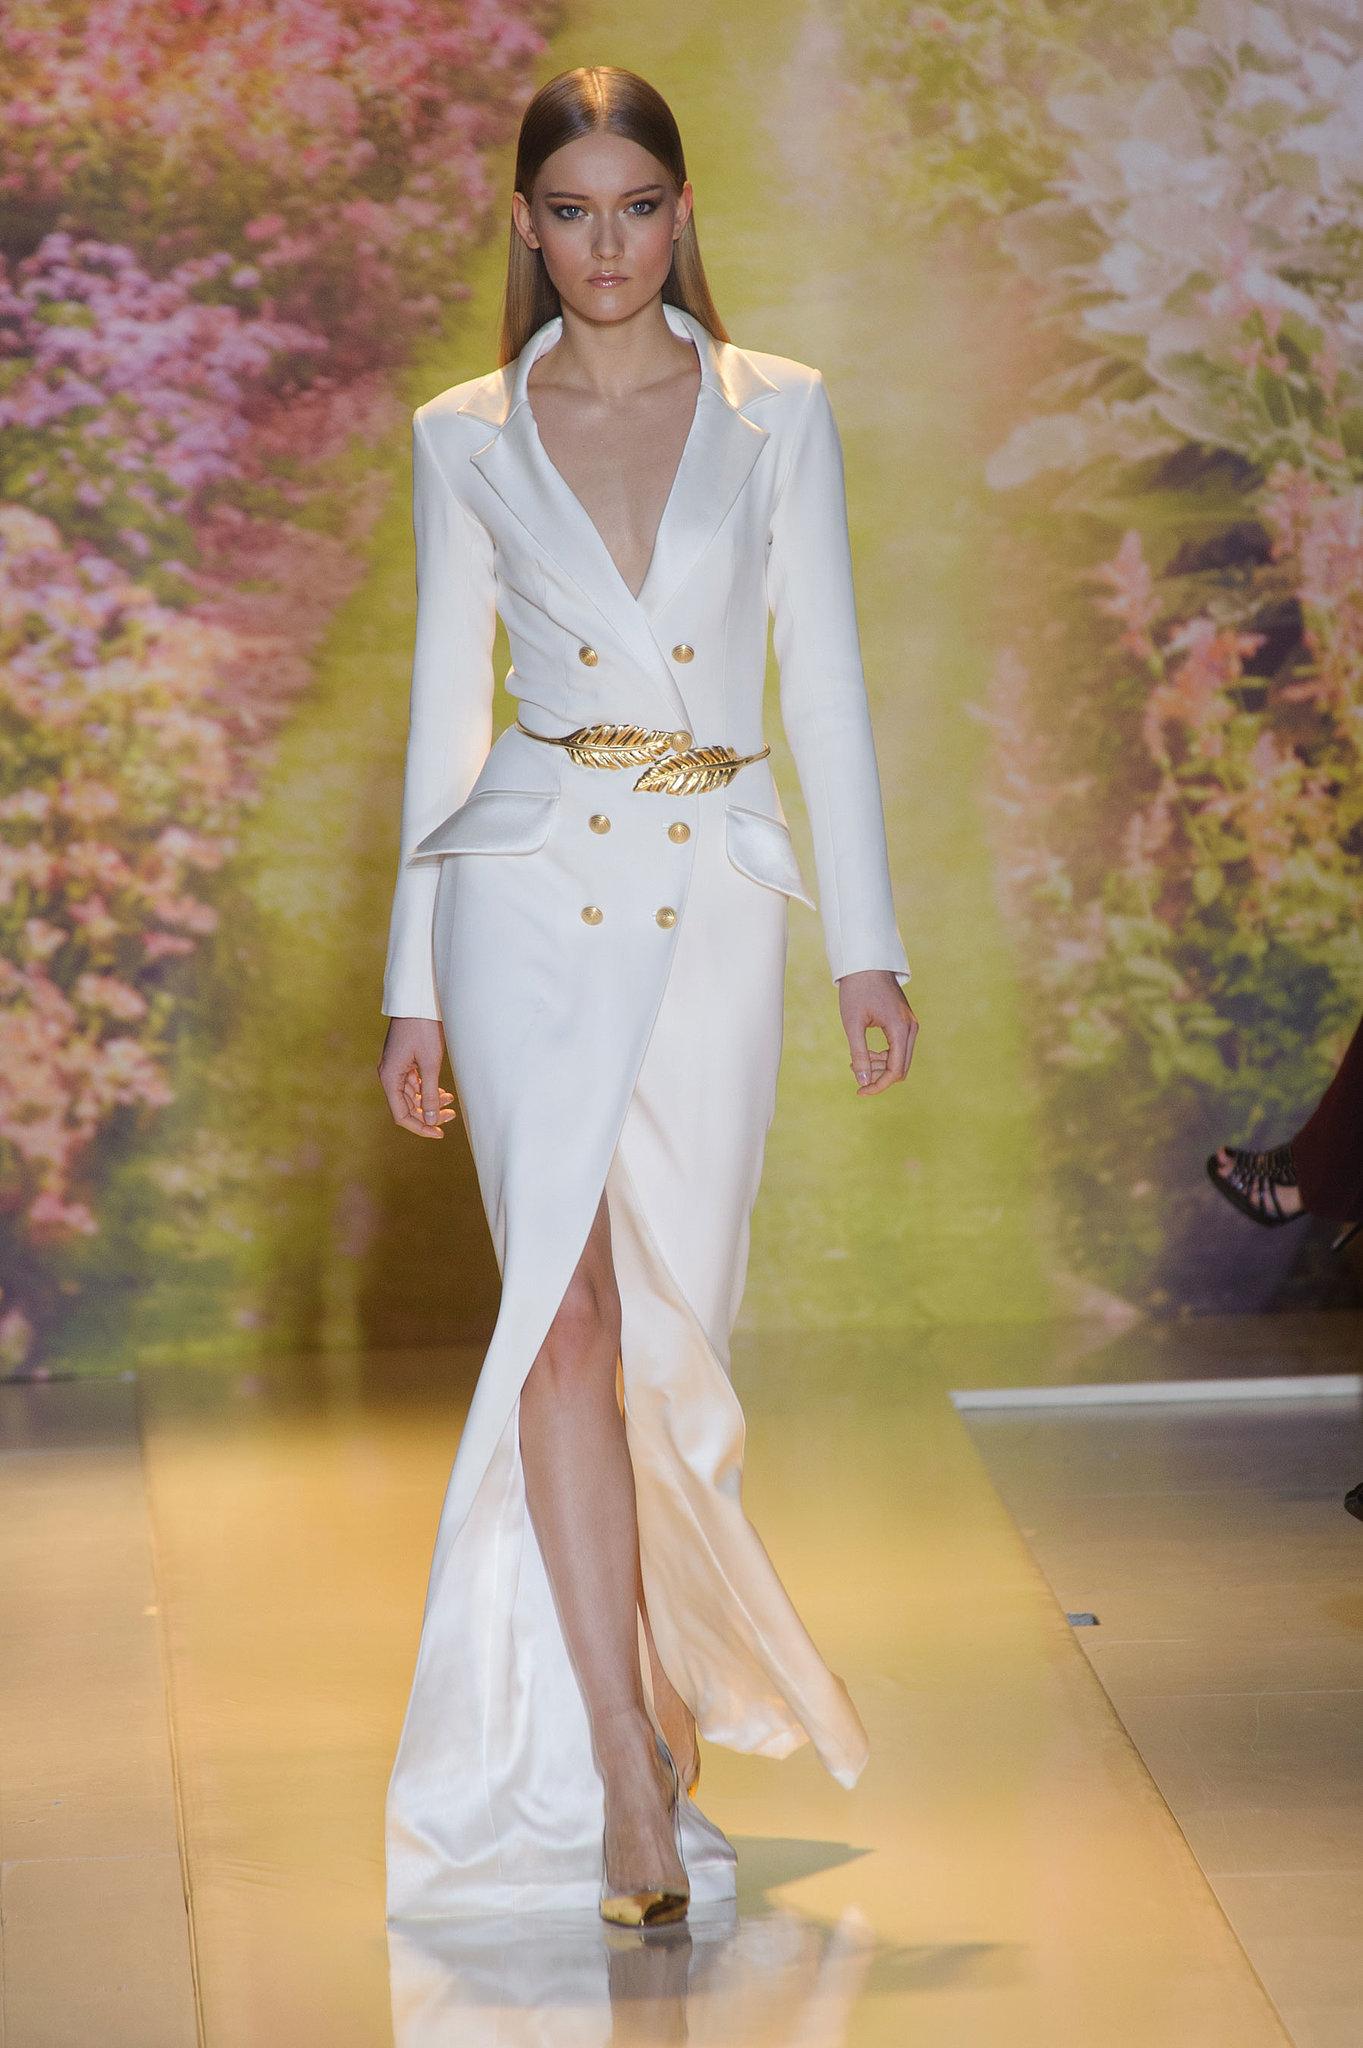 Zuhair Murad Haute Couture Spring 2014Zuhair Murad Haute Couture 2014